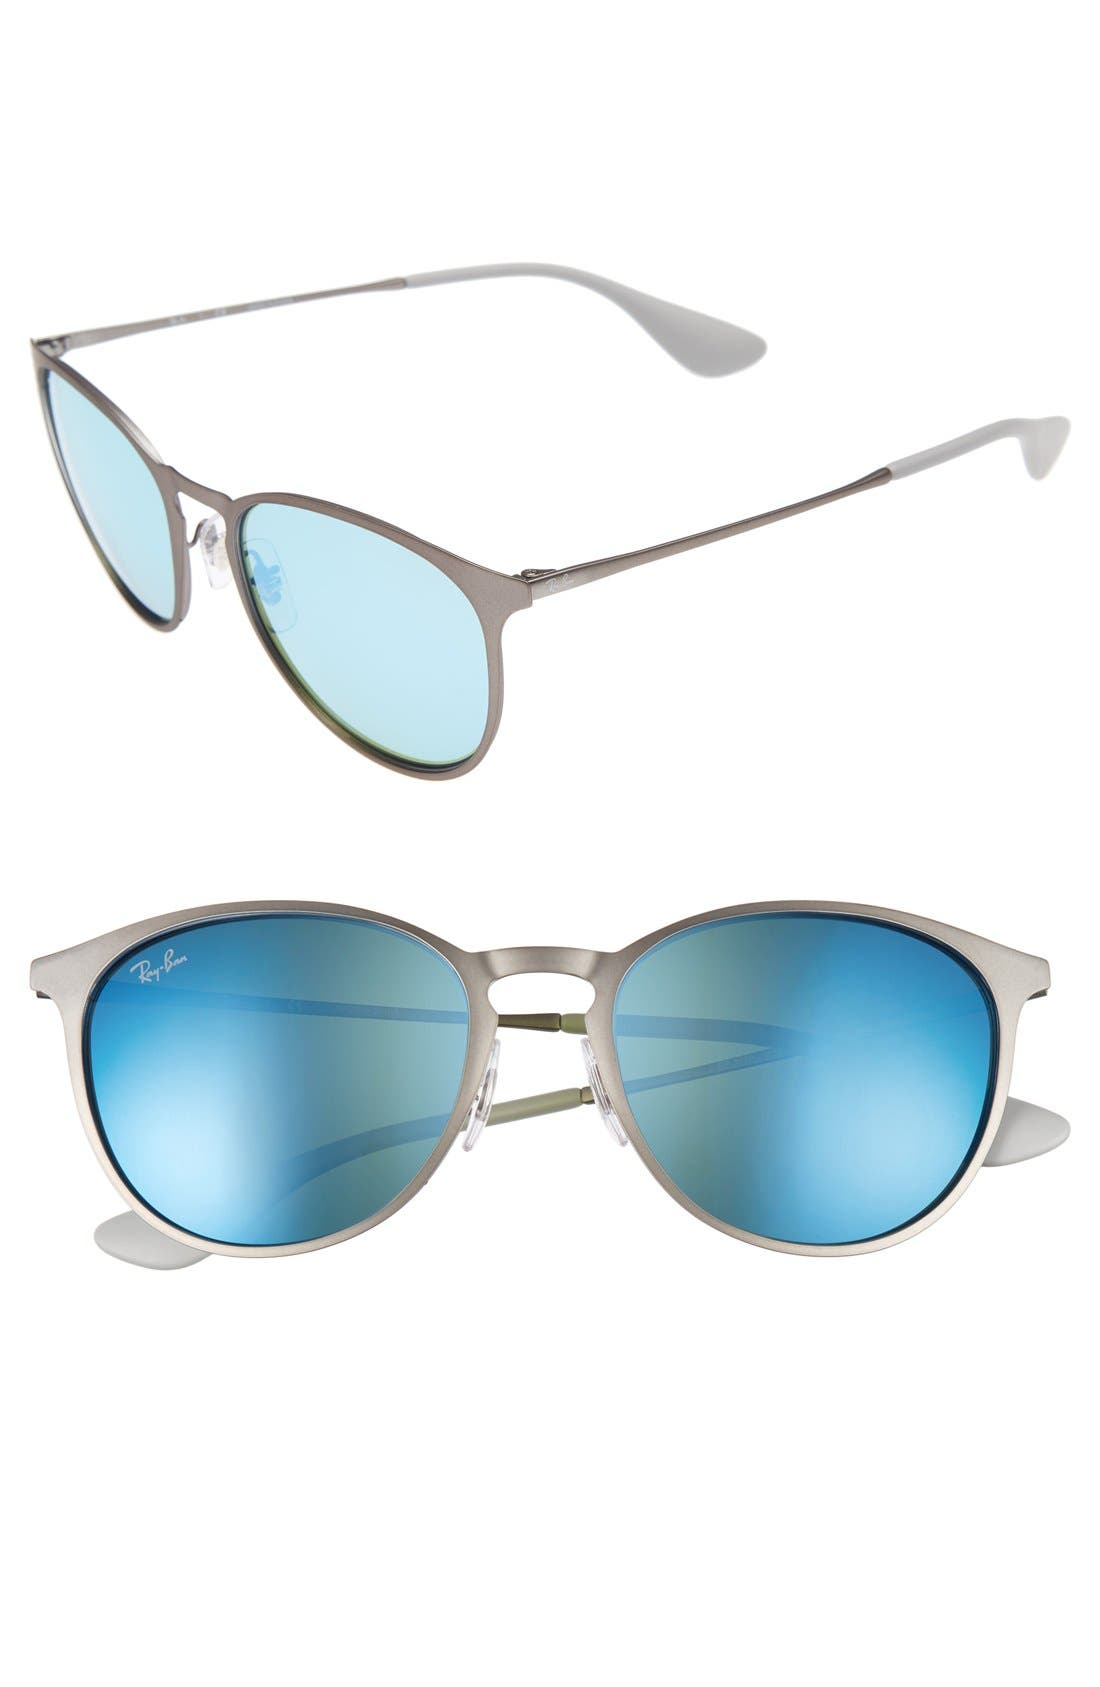 Ray-Ban Highstreet 54mm Sunglasses